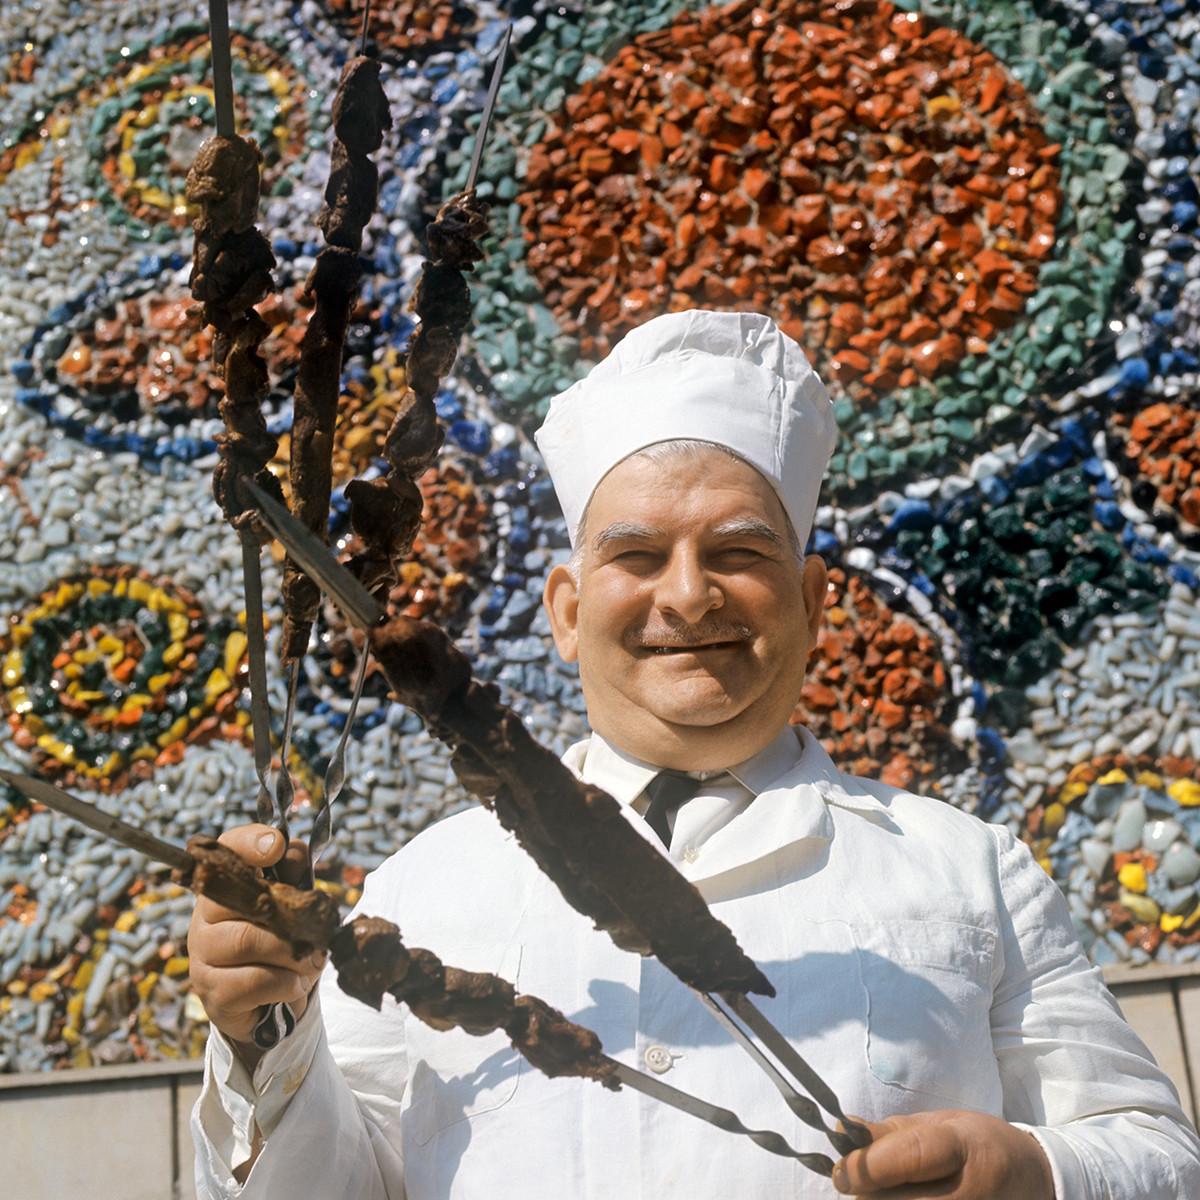 Главен готвач, който държи шишчета шашлик в Грузинска ССР, 1971